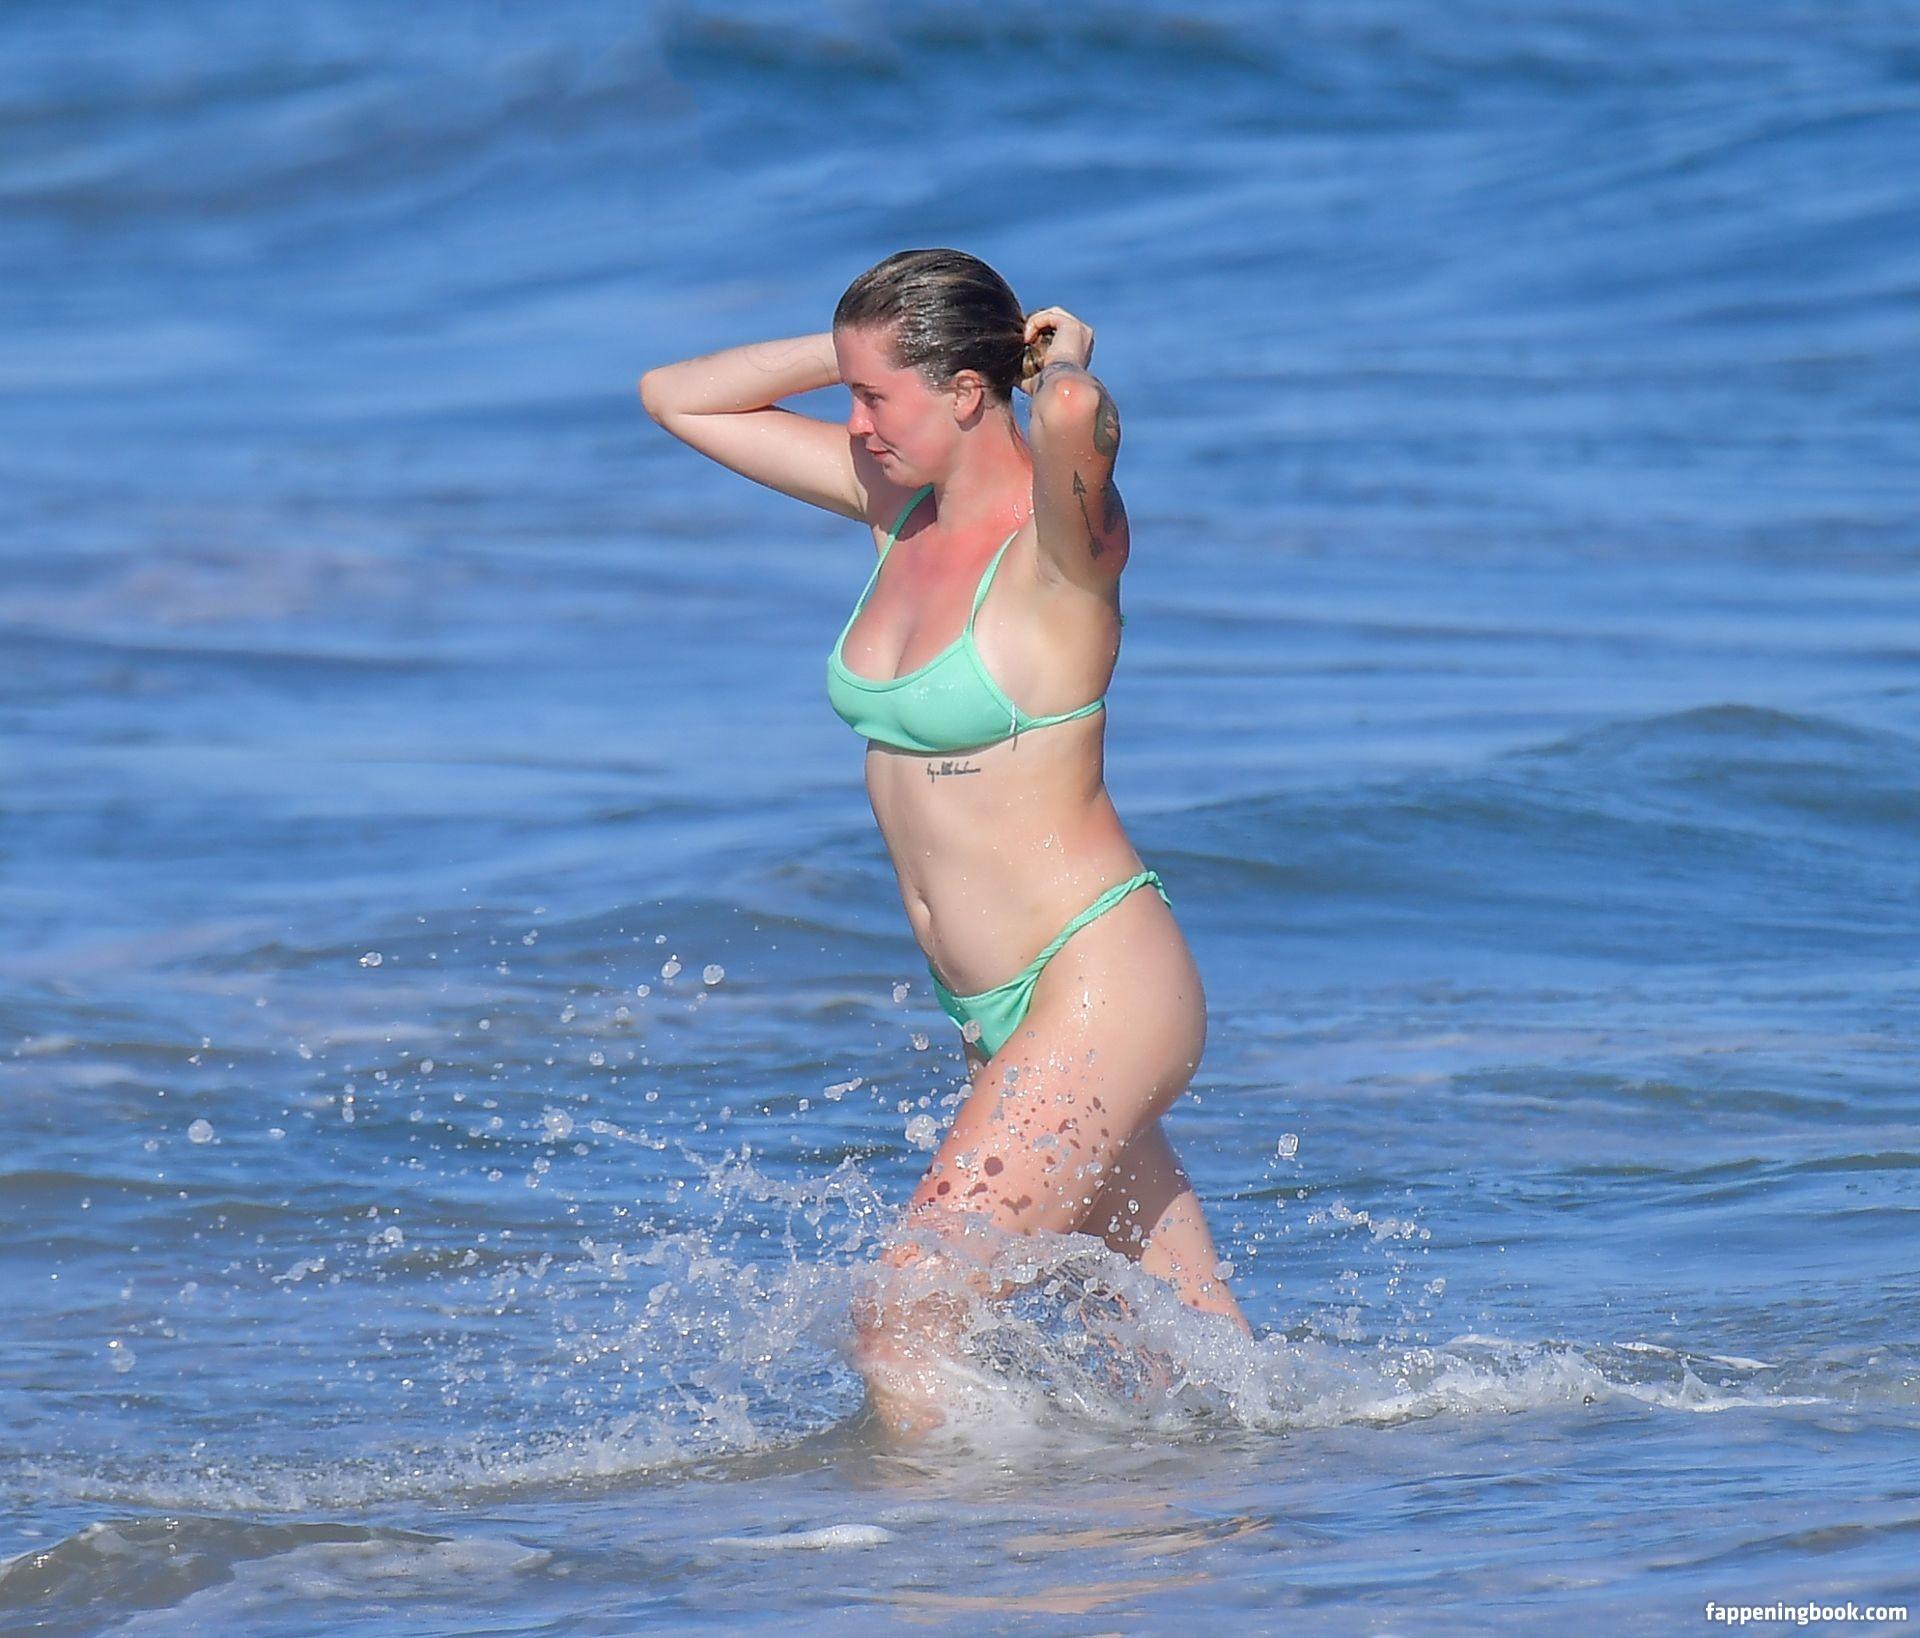 Ireland Baldwin Nude, Sexy, The Fappening, Uncensored